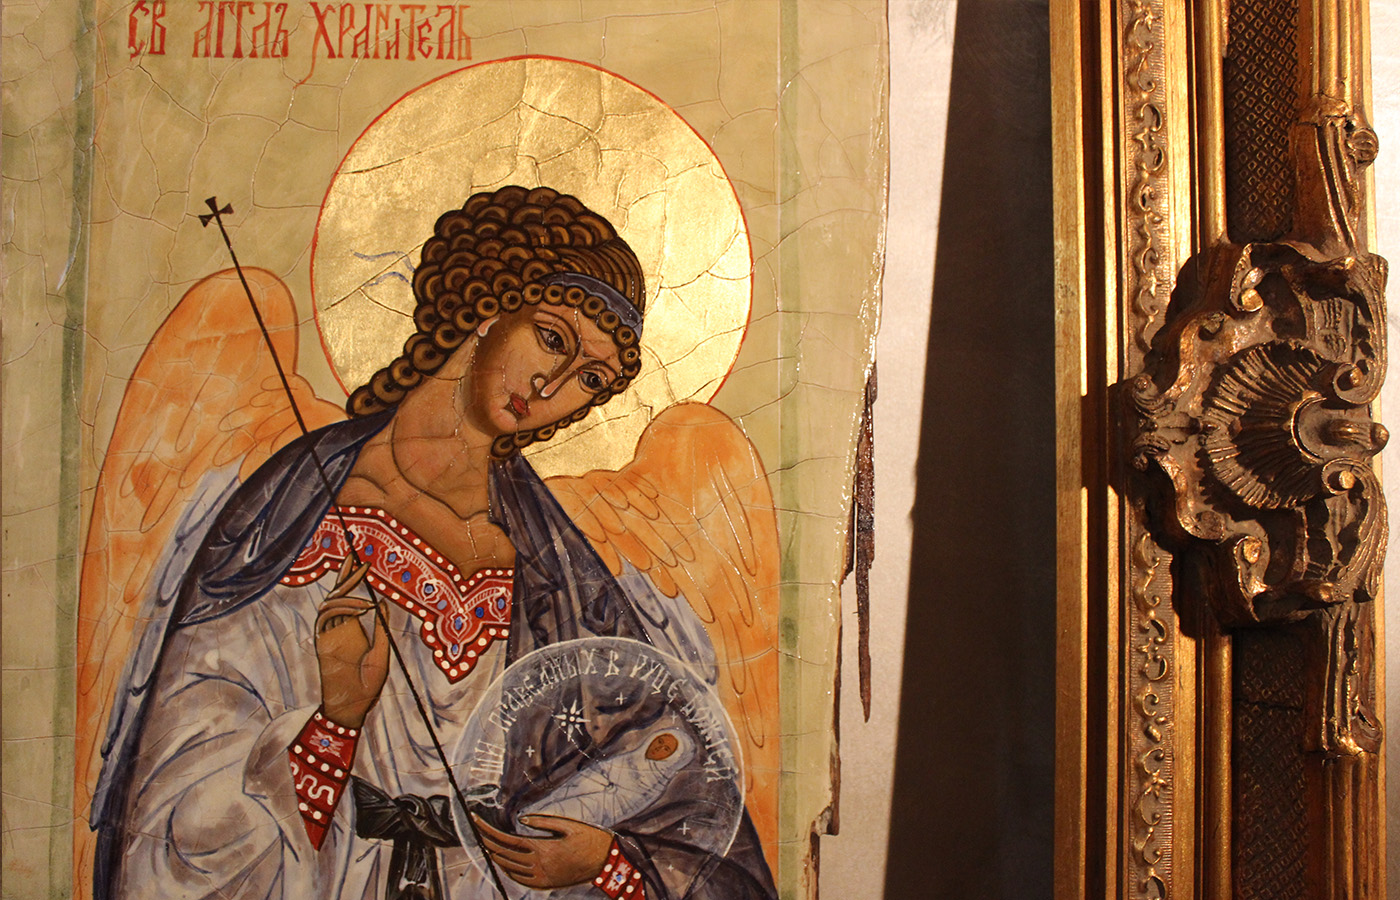 italian-heritage-vendita-icone-roma-elena-chugunova-icone-sacre-russe-roma-quadretti-religiosi-icone-sacre-prezzi